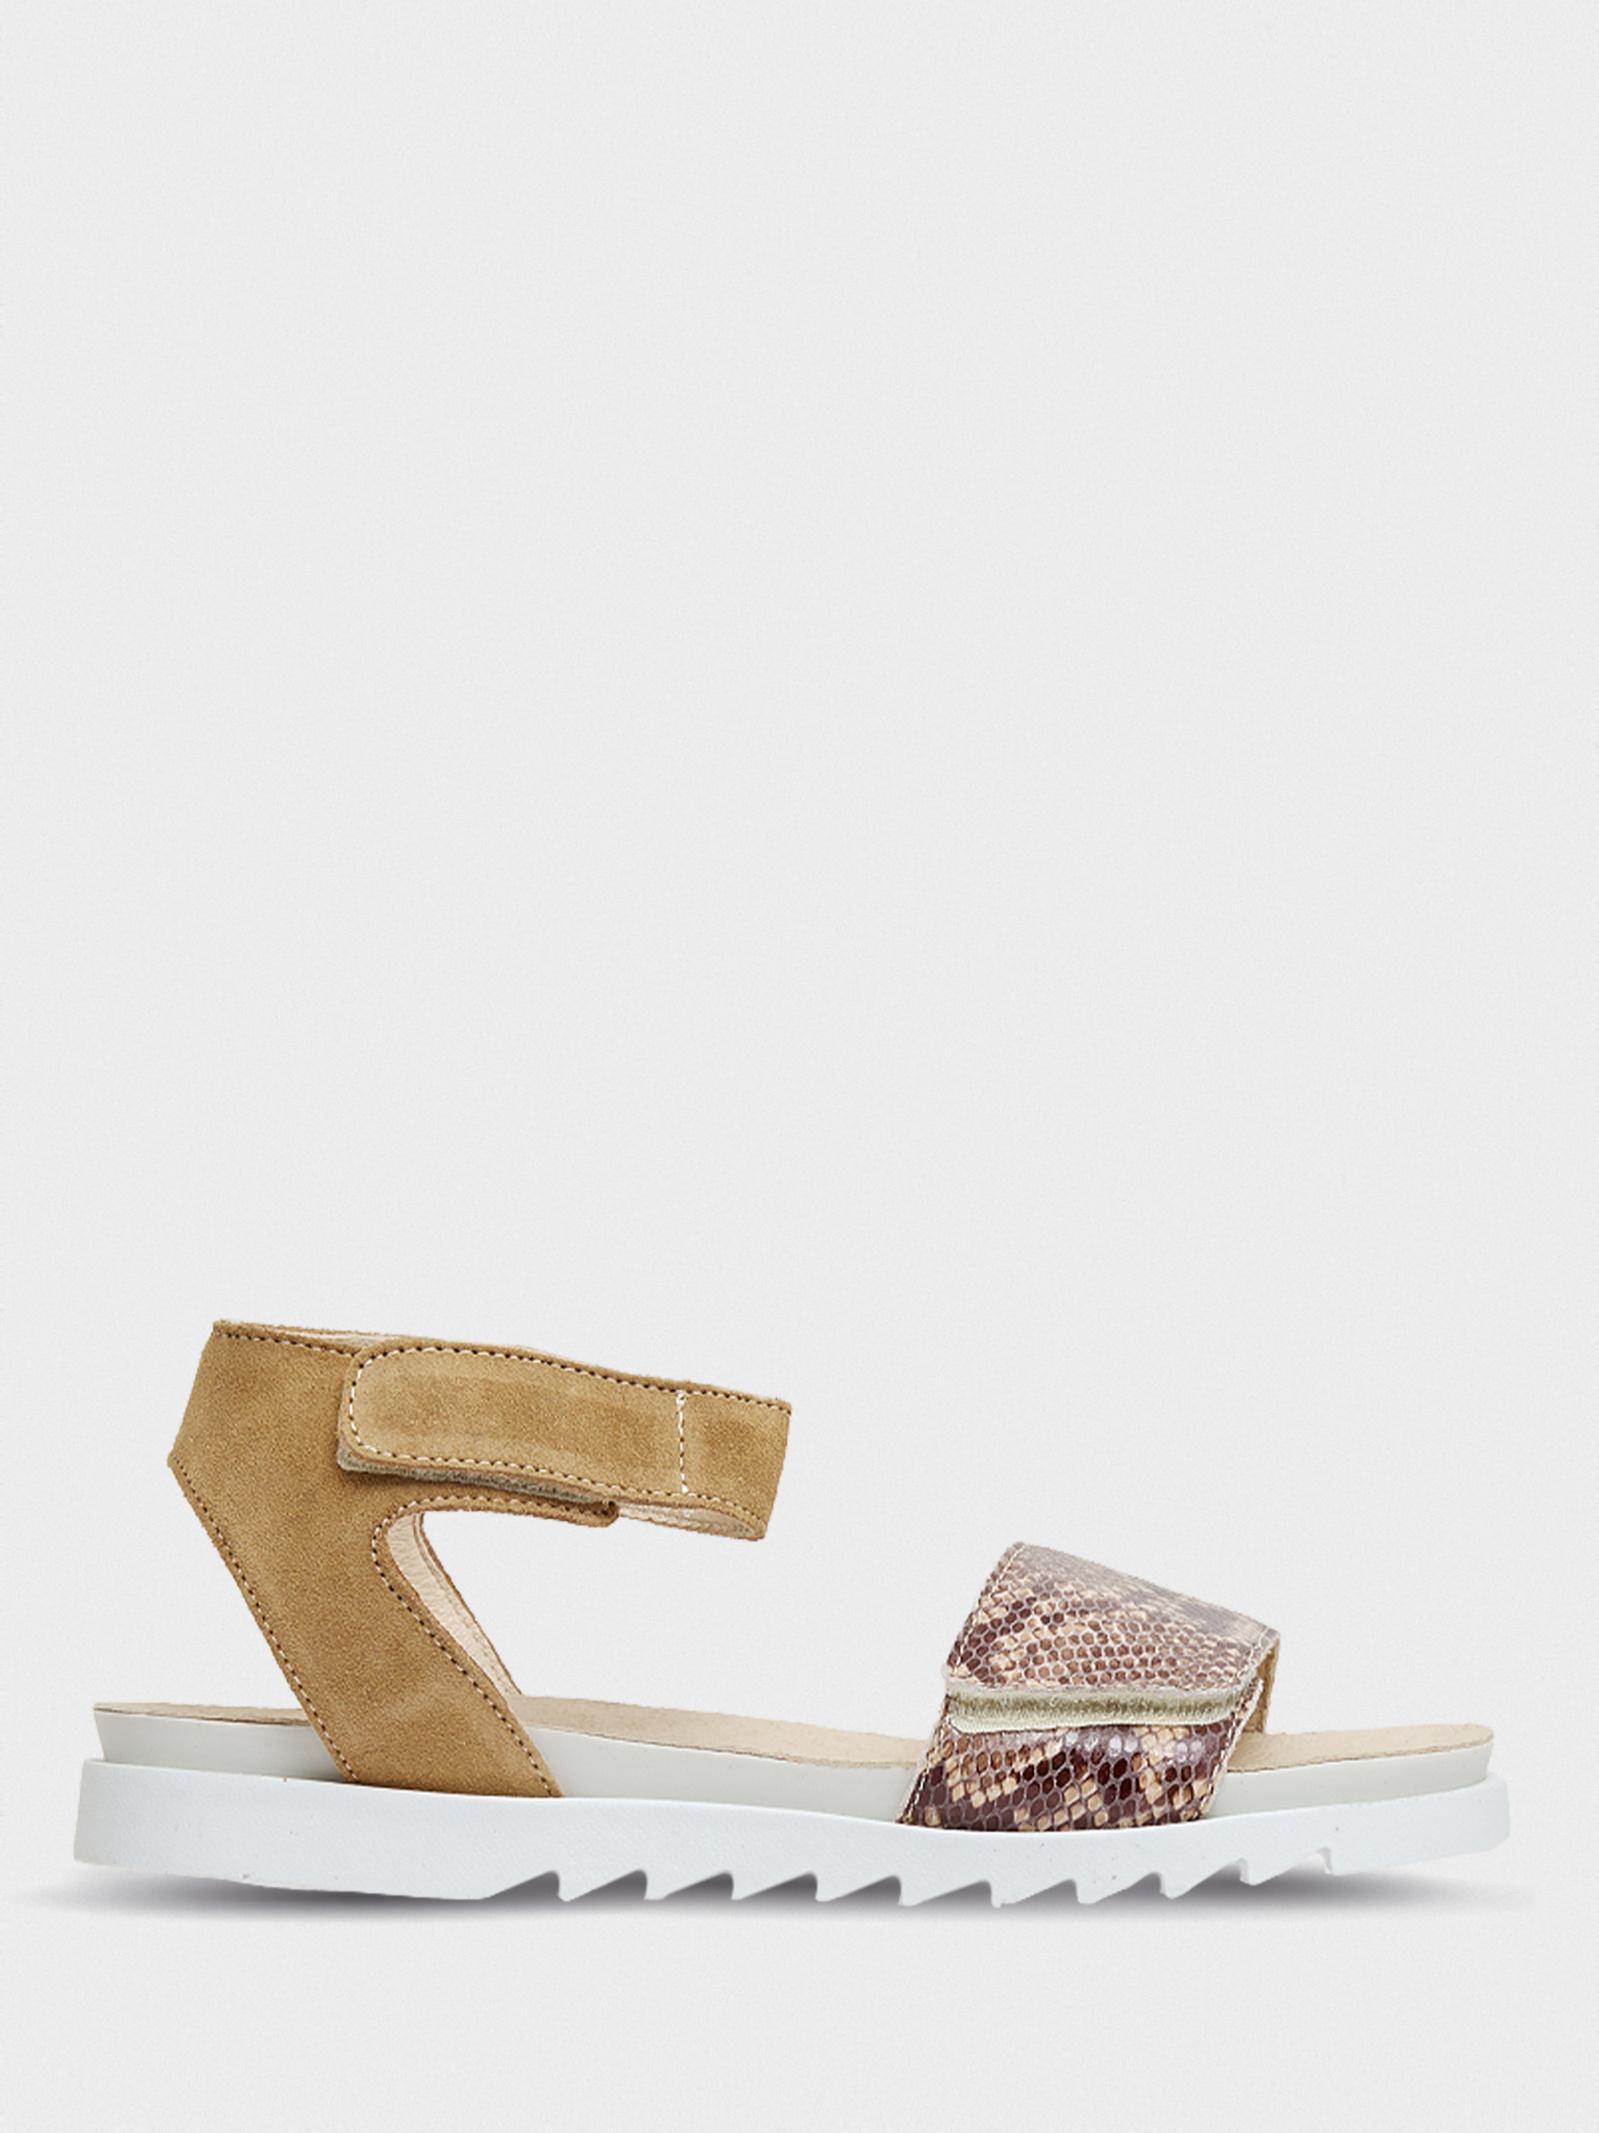 Сандалии женские Filipe Shoes 10076 размеры обуви, 2017